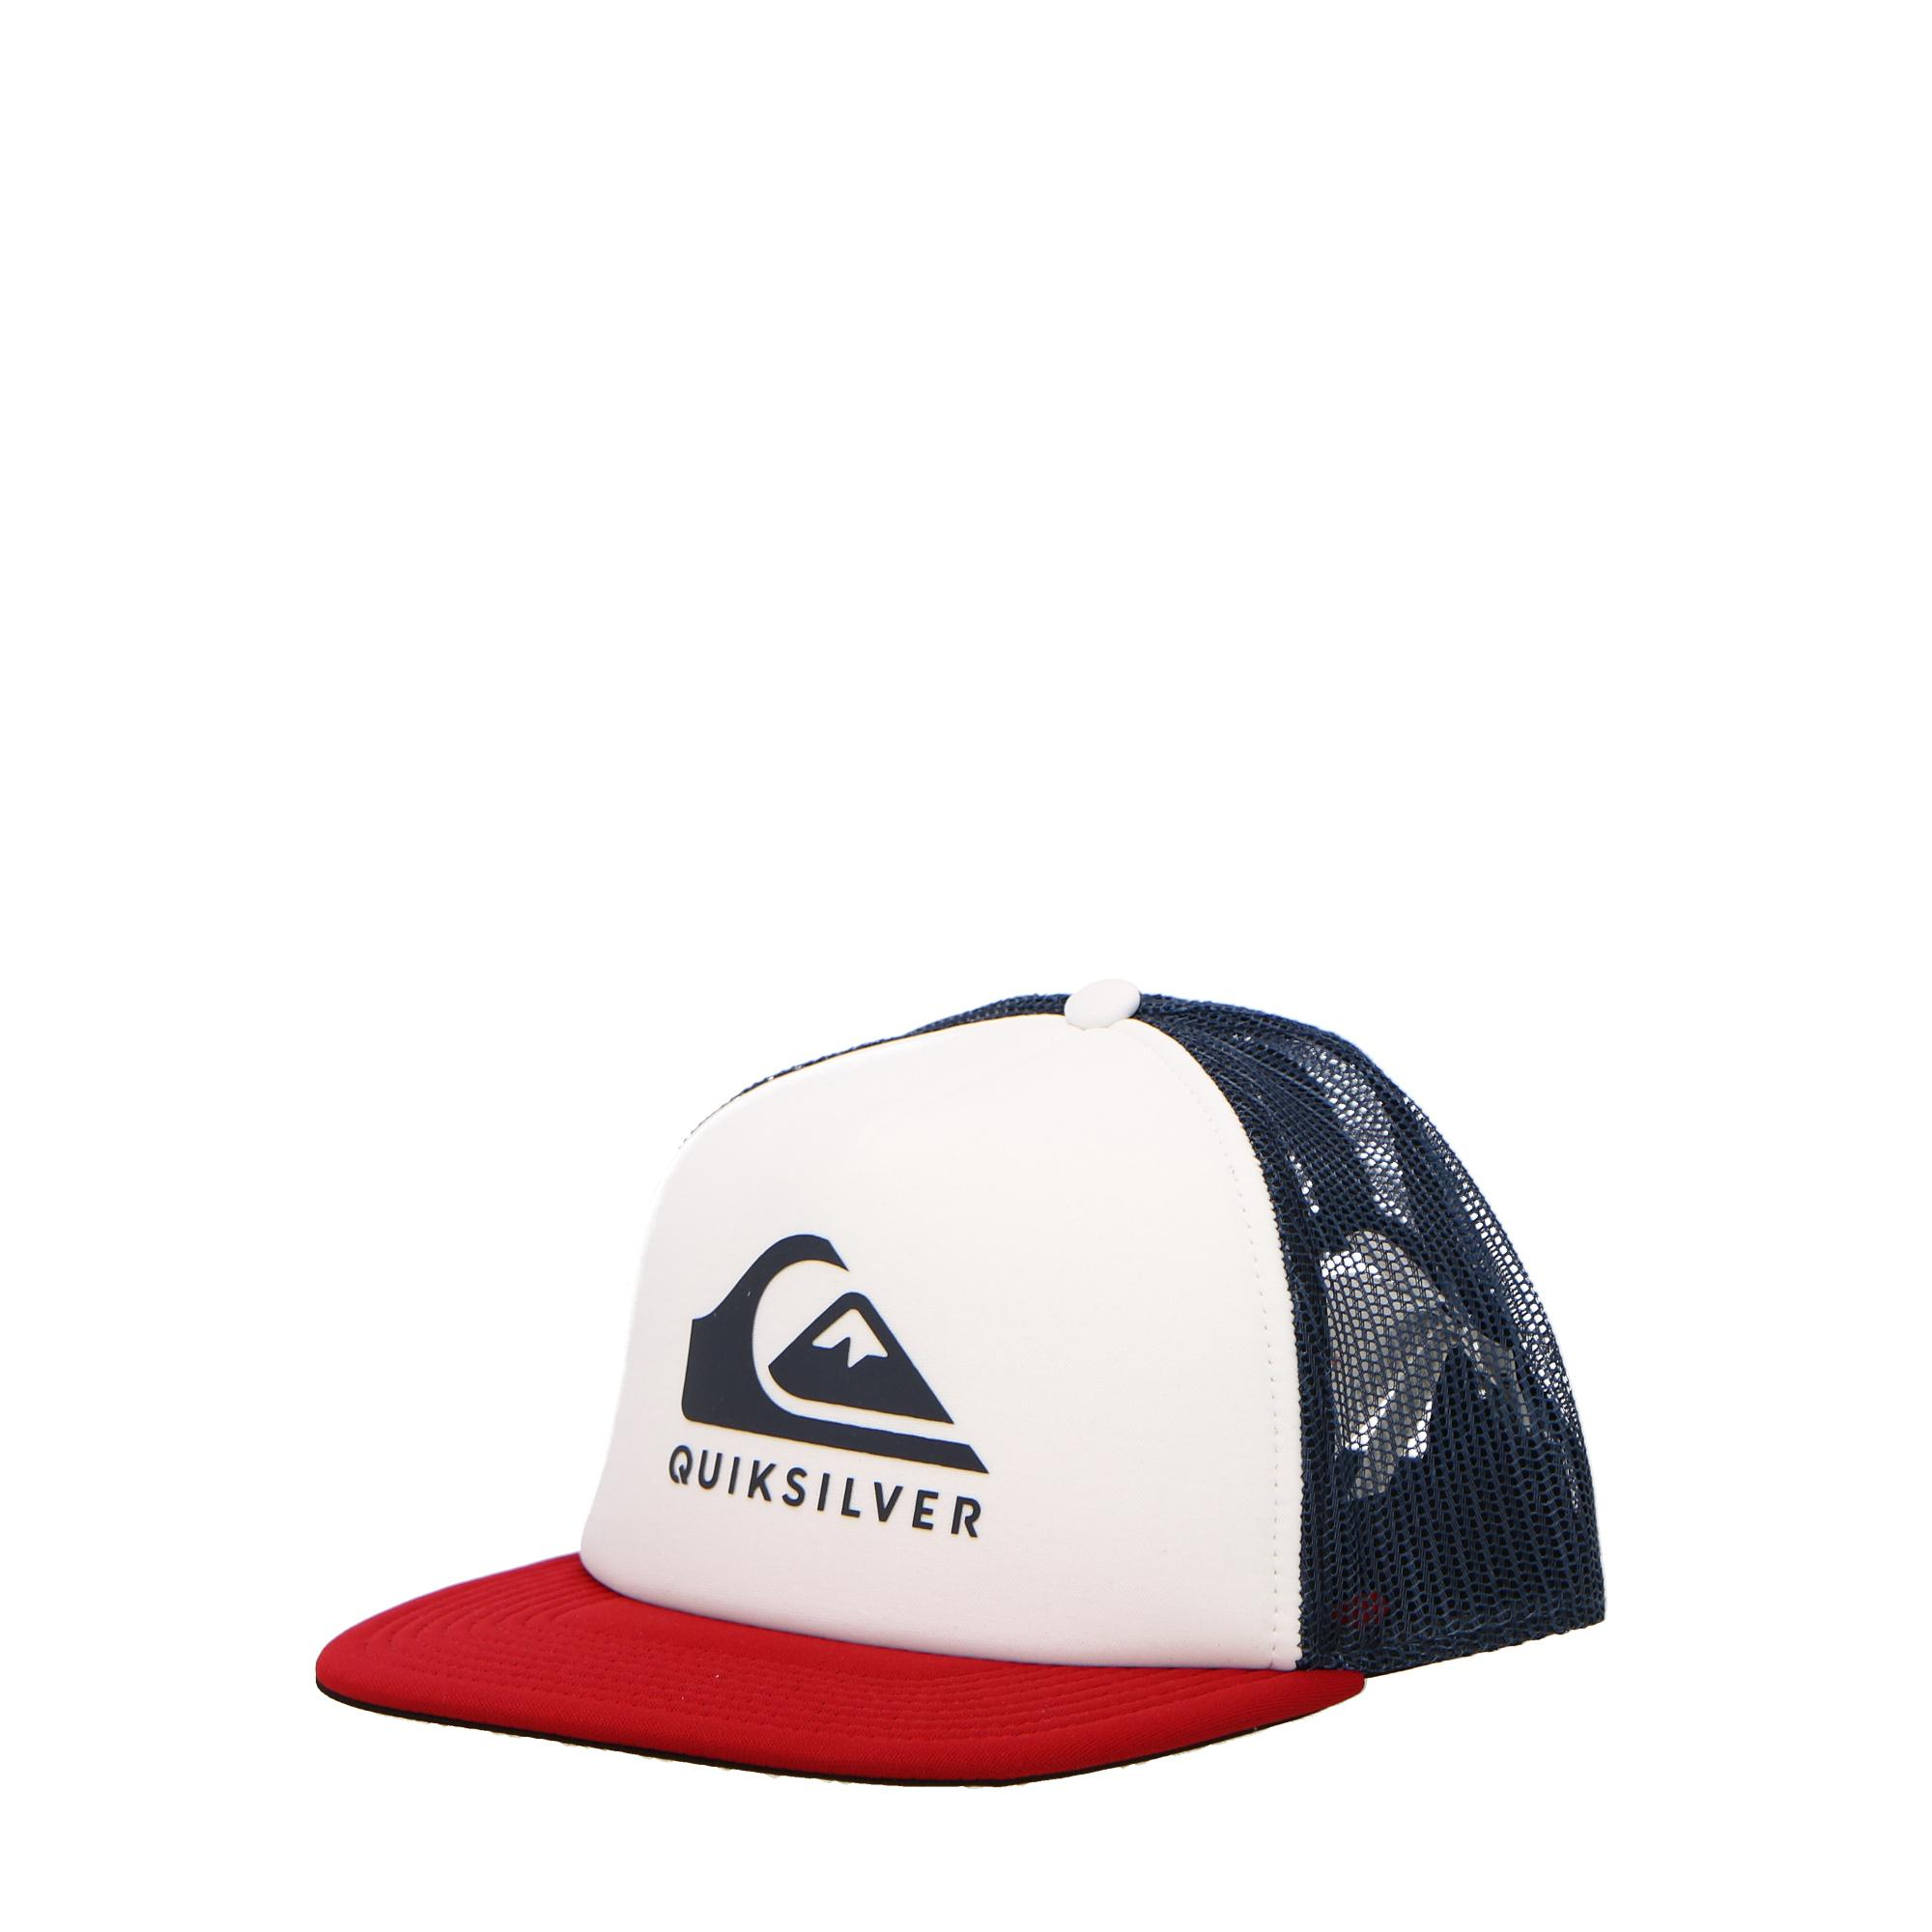 Quiksilver Foamslayer WHITE